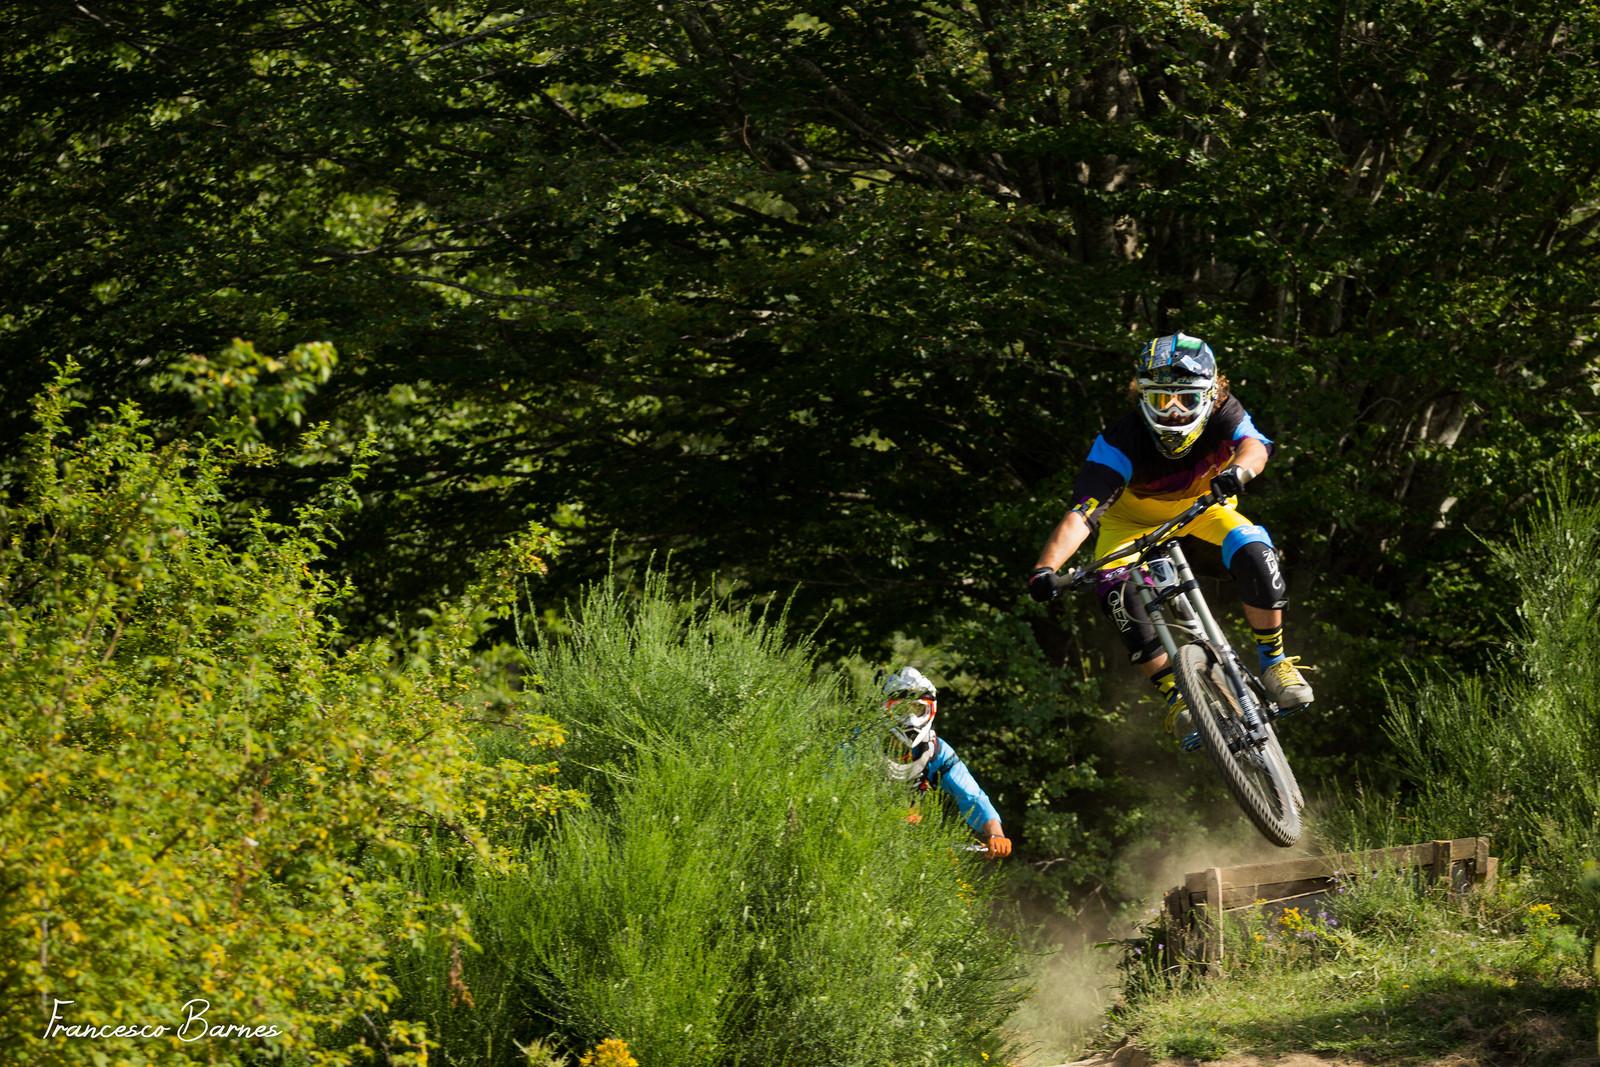 Matteo Lupidi at Pratoselva bikepark - Gladiax87 - Mountain Biking Pictures - Vital MTB